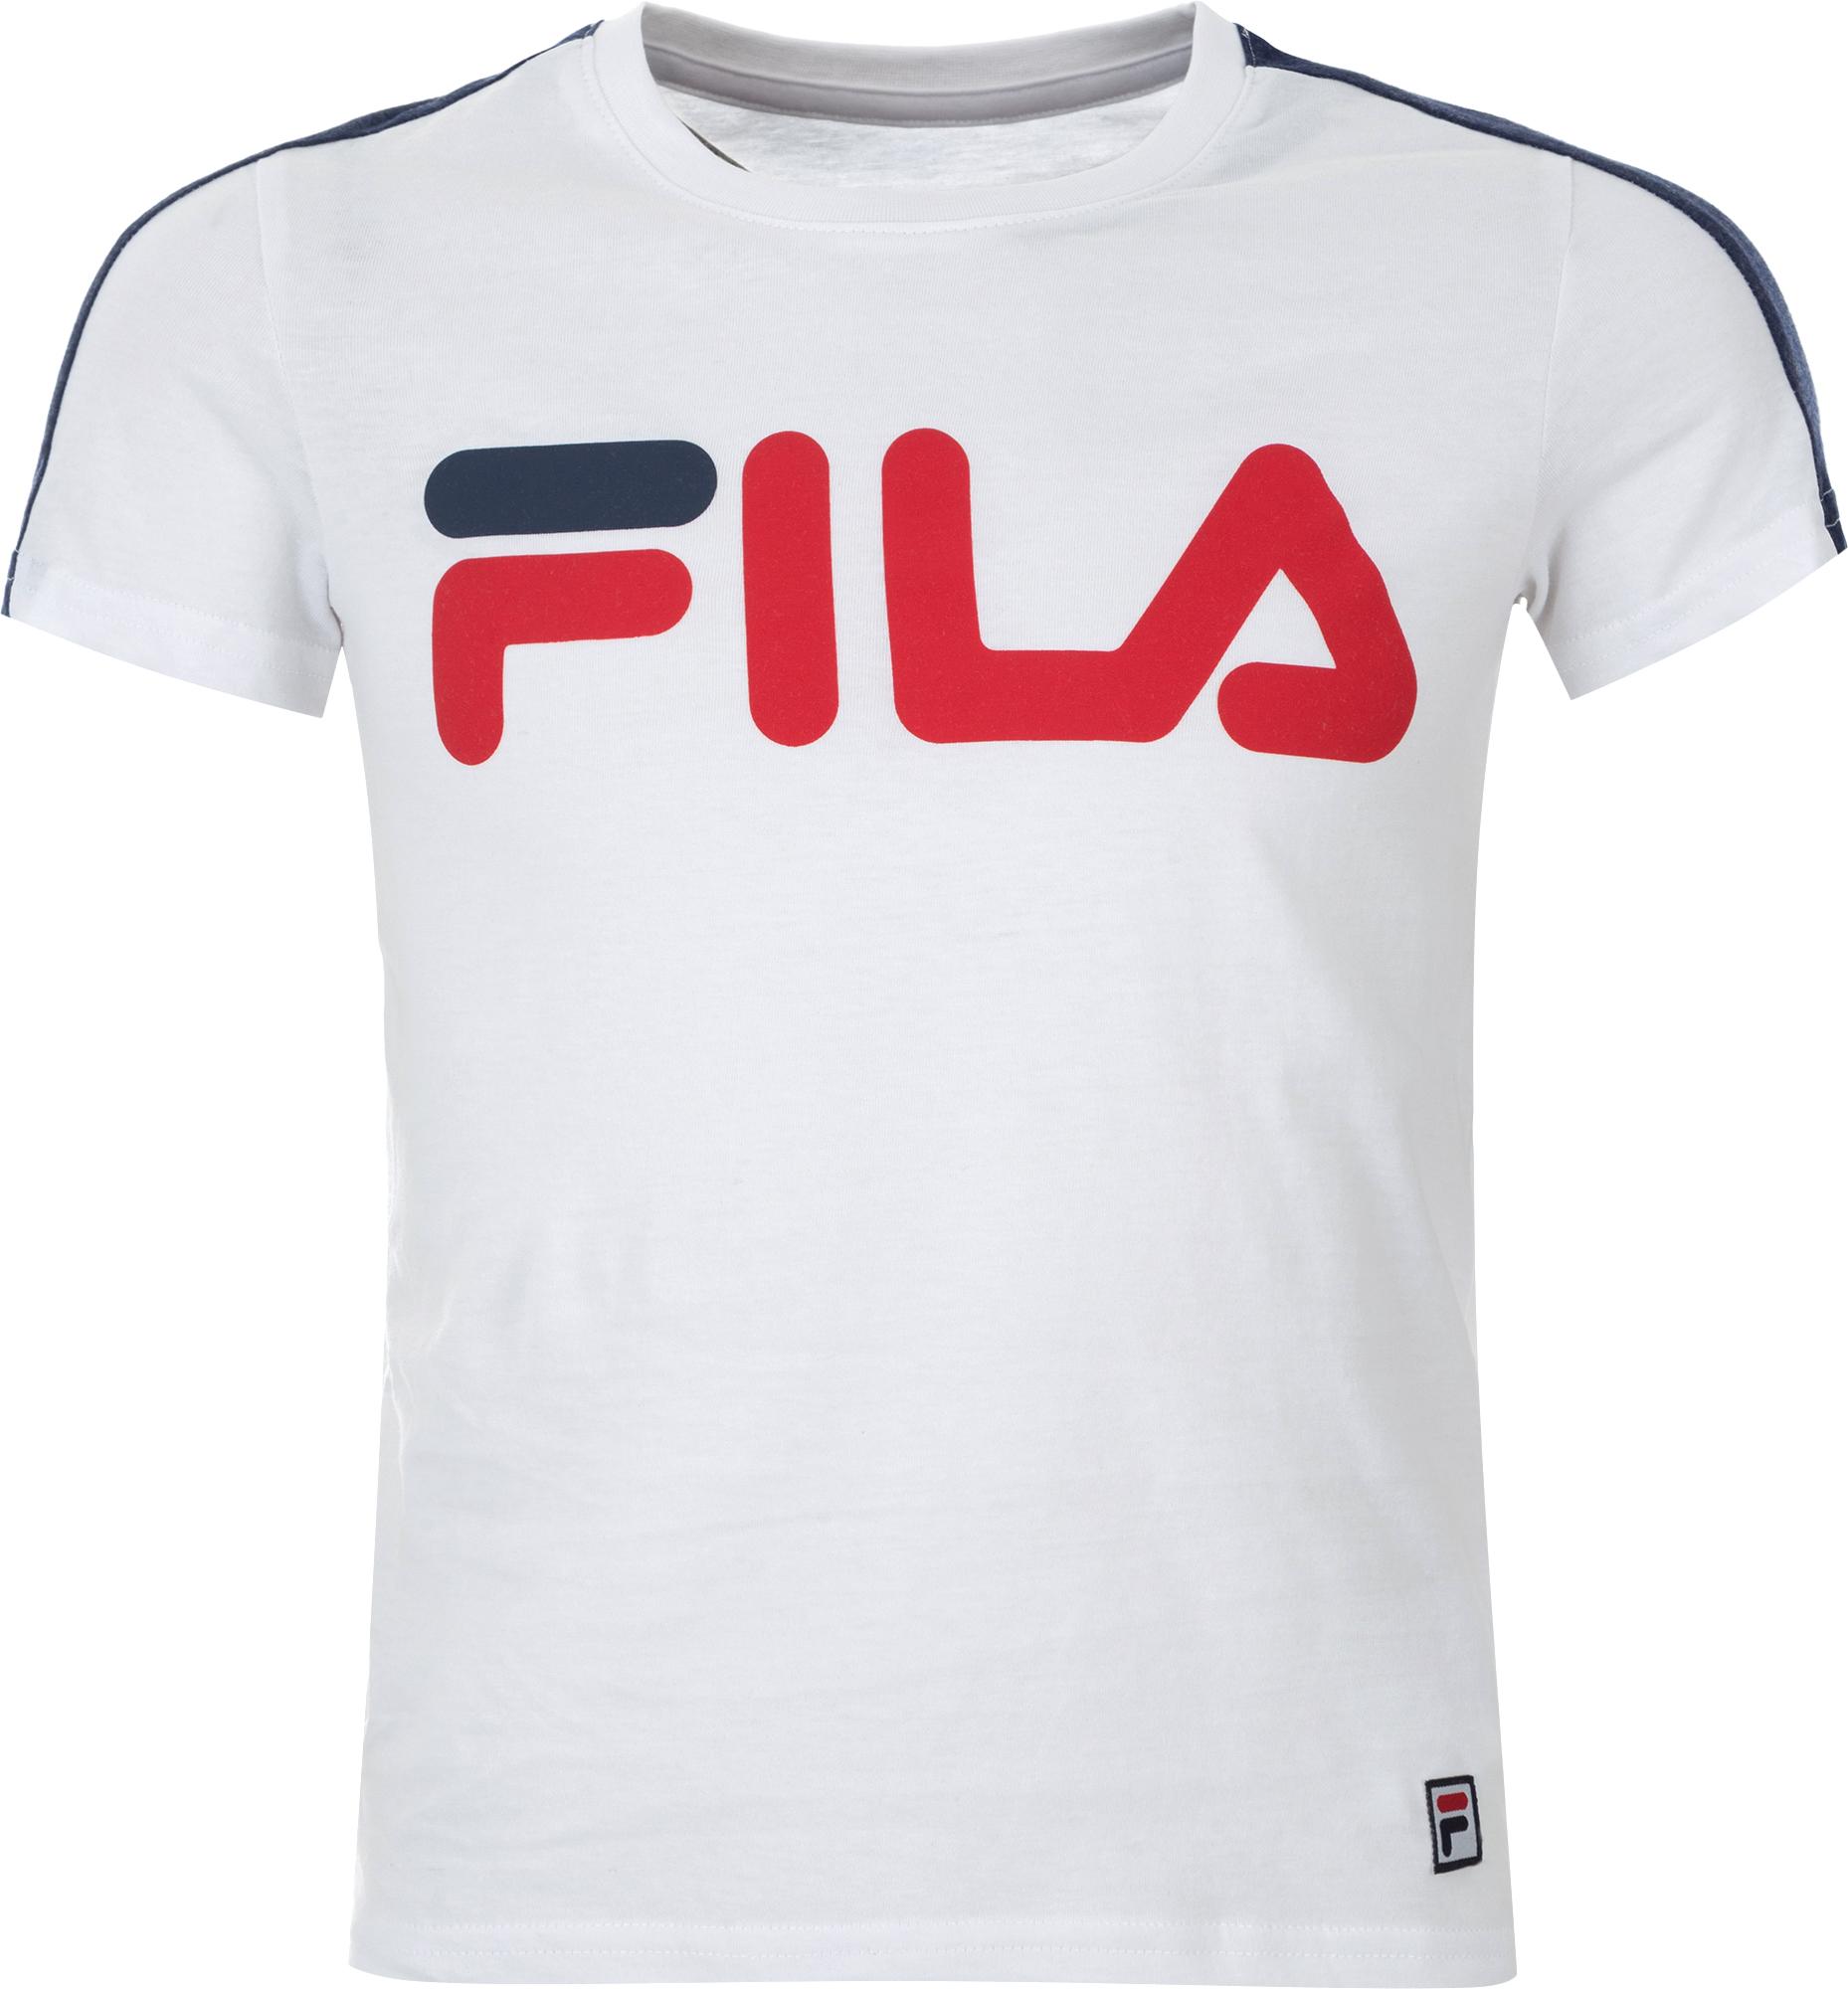 Fila Футболка для мальчиков Fila